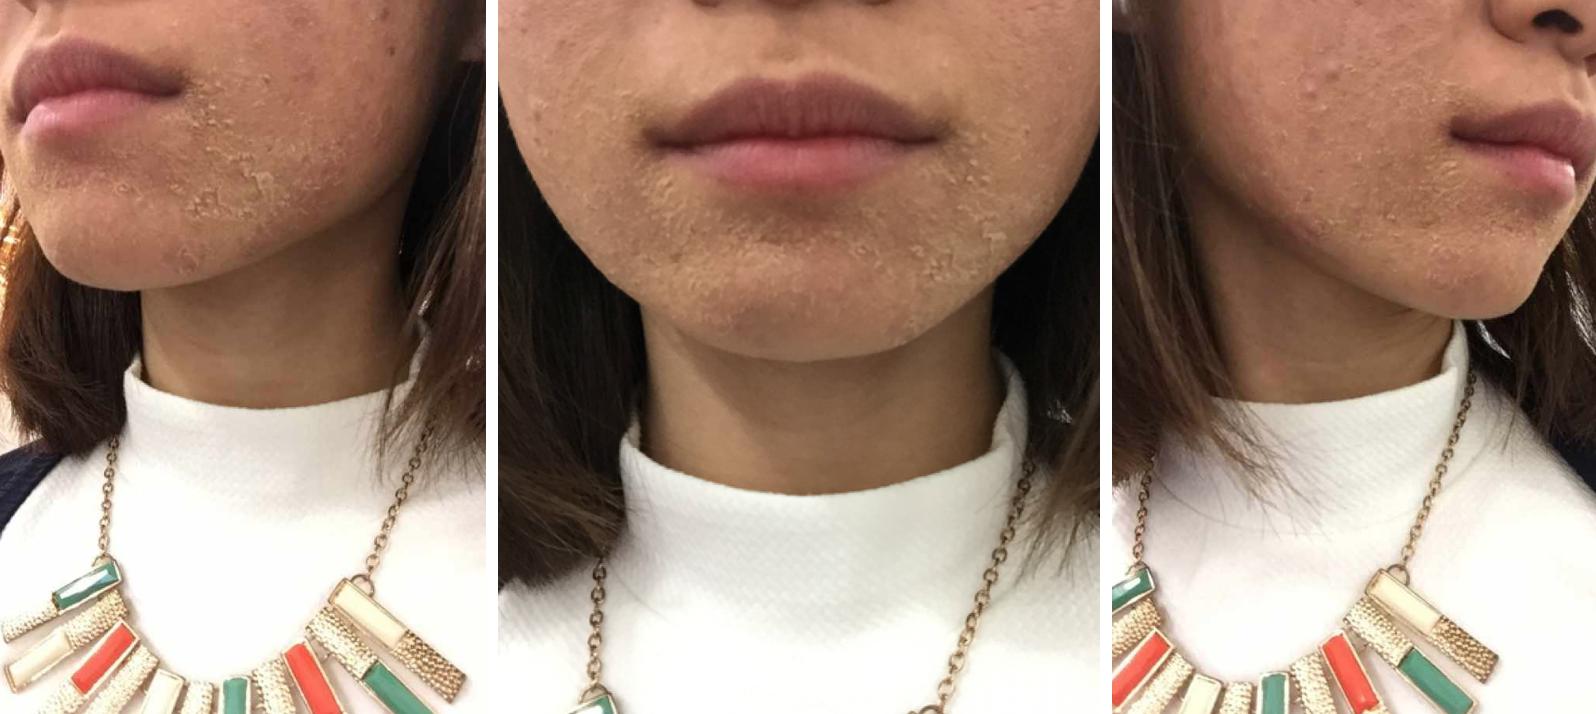 The Clifford Clinic Severe Cystic Acne Treatment Singapore AGNES Acne Treatment Q Switch Laser Treatment Review